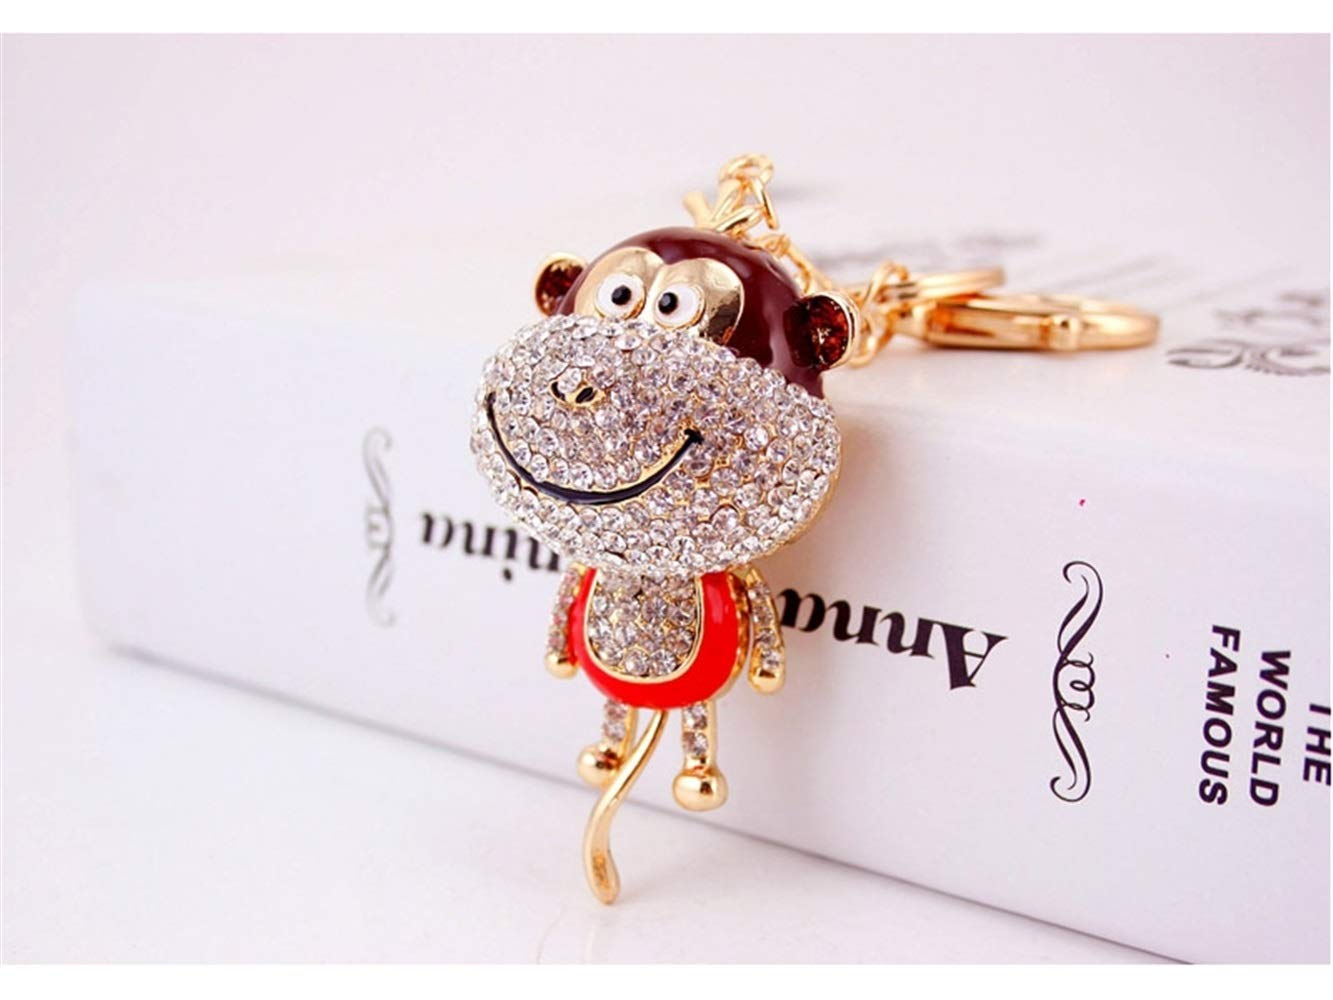 Car Keychain, Cute Diamond Long Tail Monkey Keychain Animal Shape Key Trinket Car Bag Key Holder Decorations(Red) for Gift